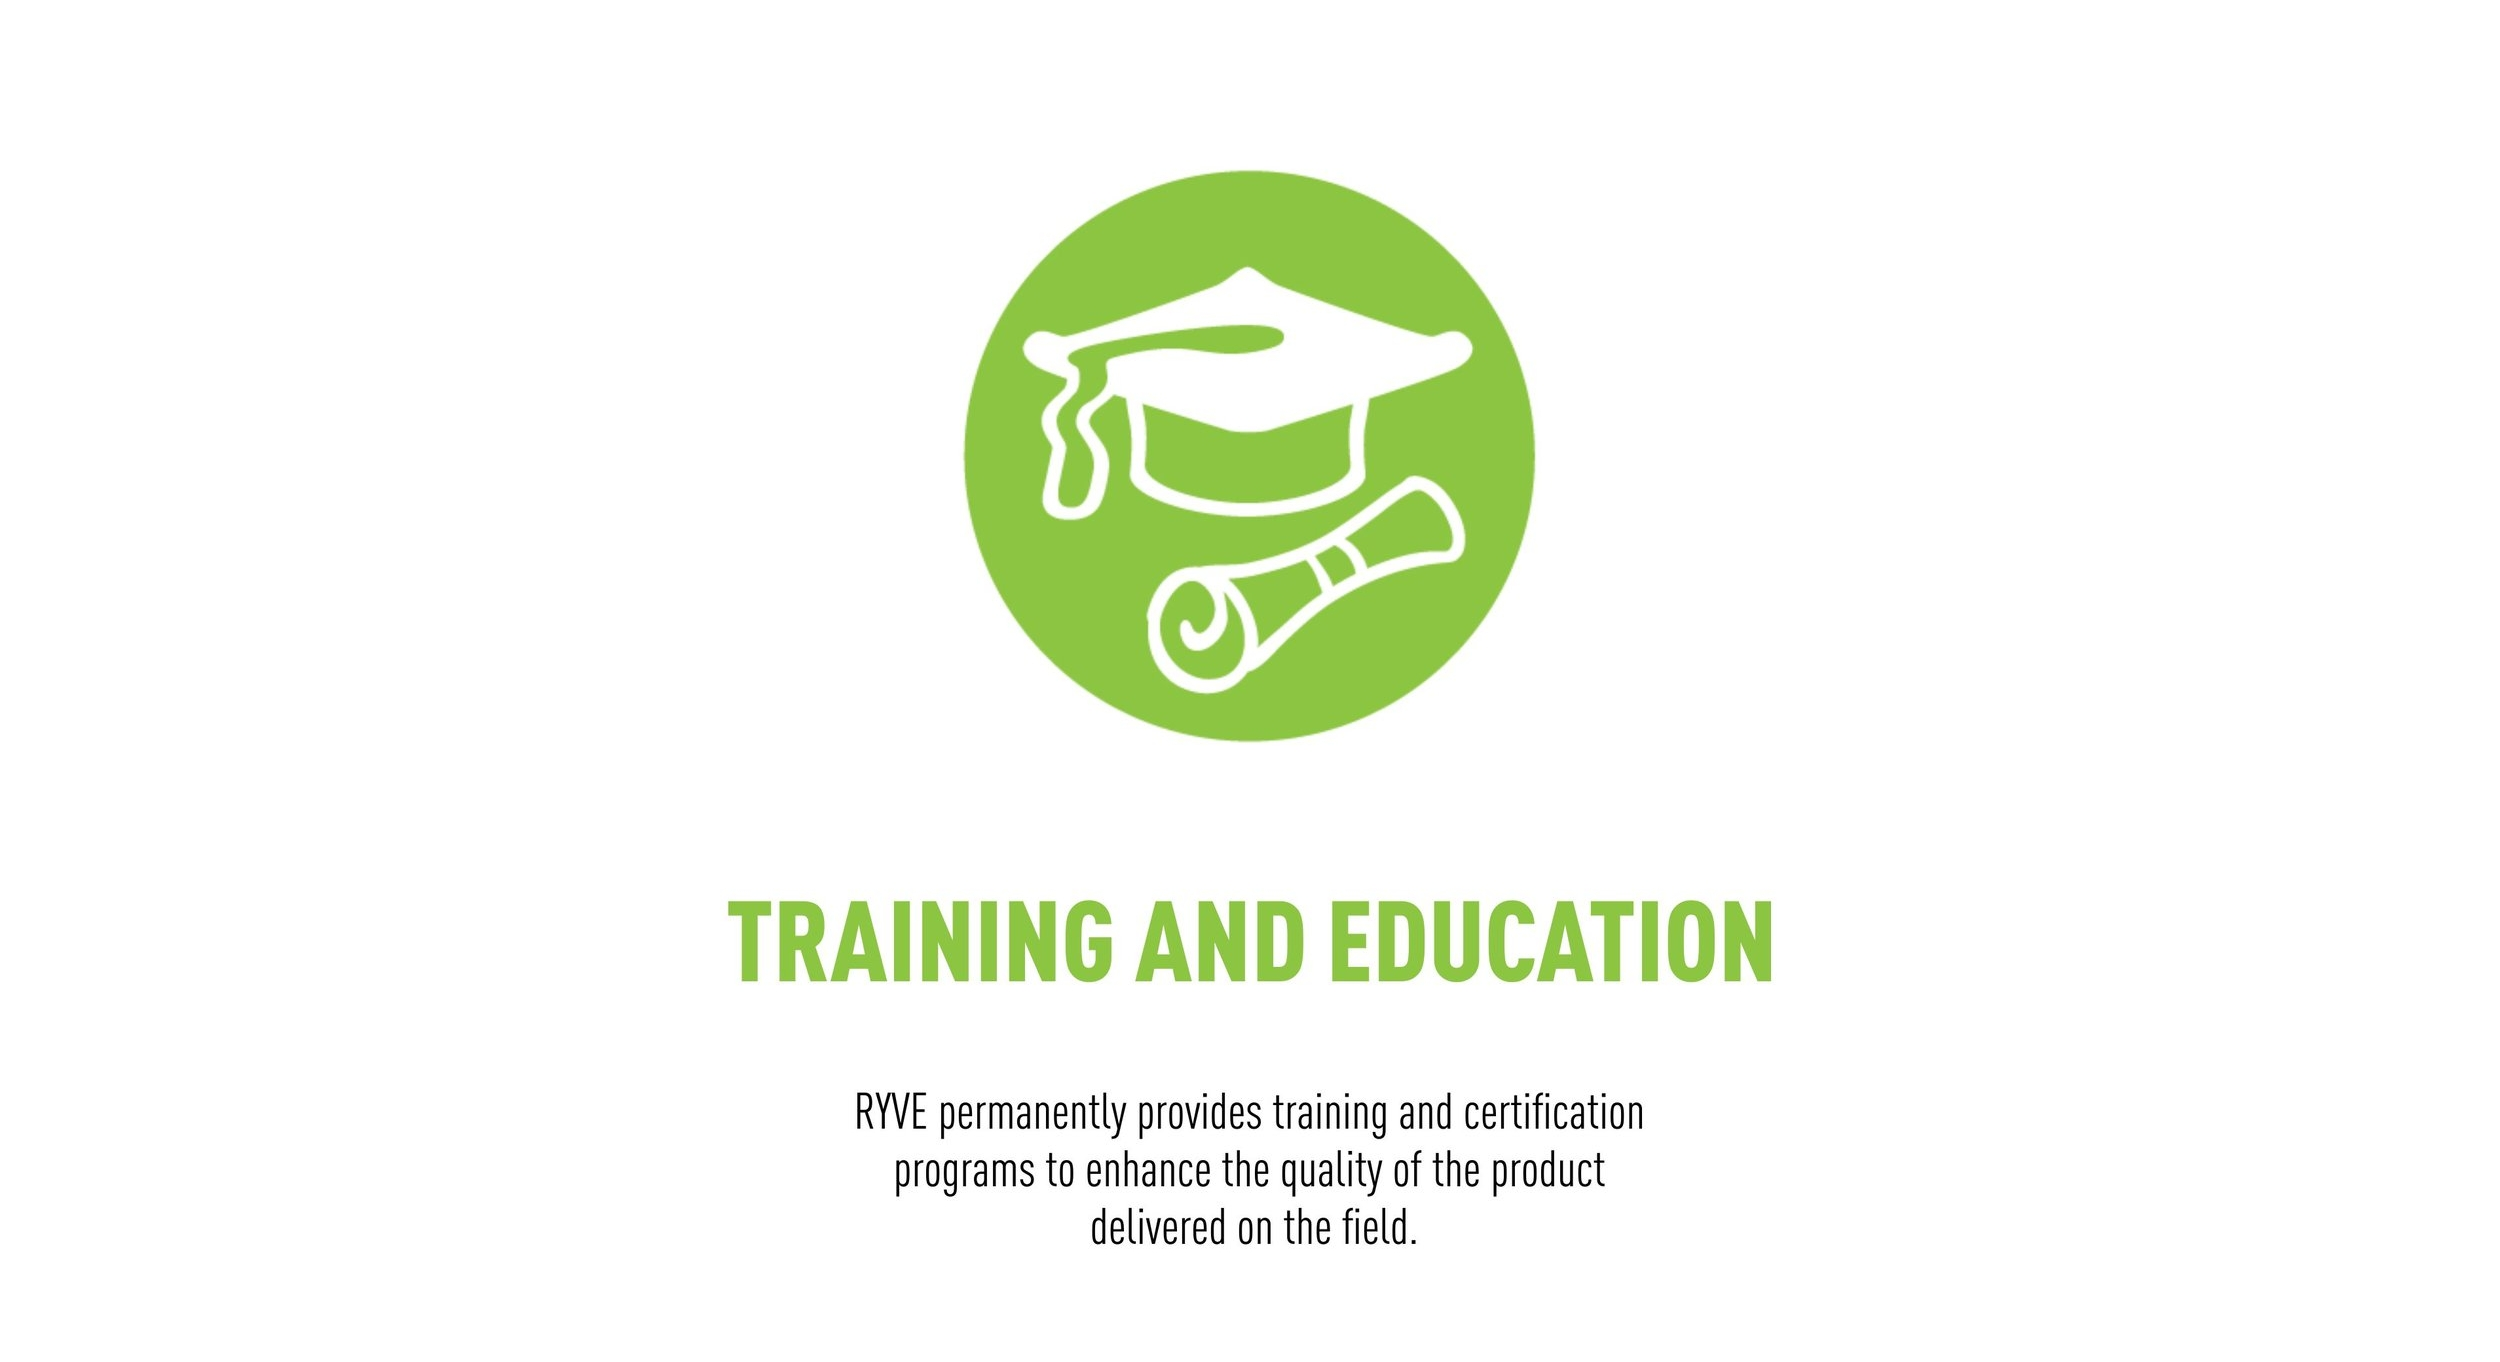 TRAINING AND EDUCATION 2.jpg